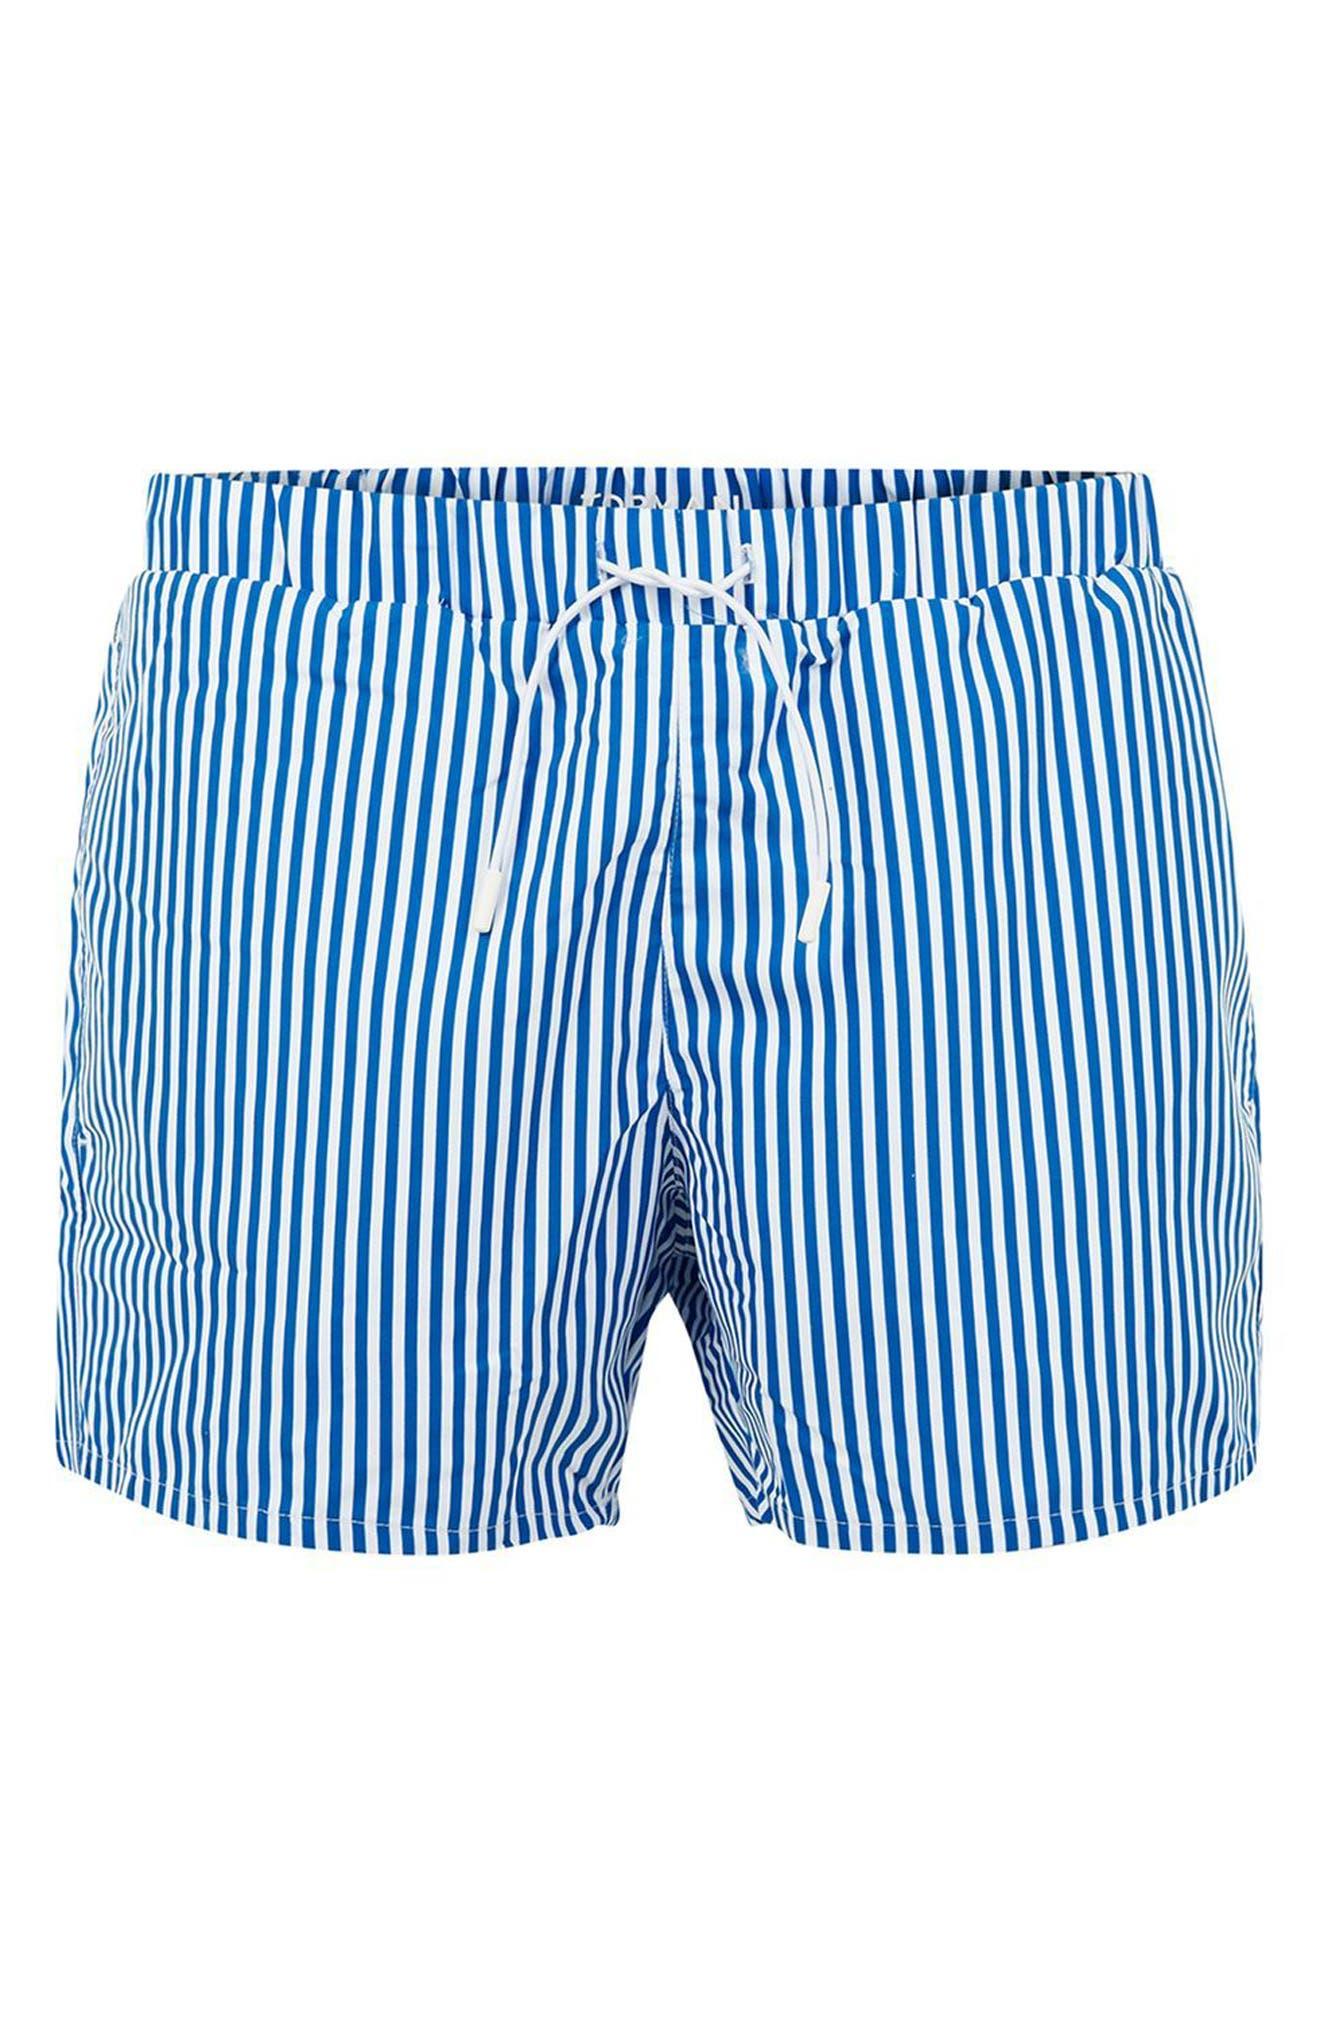 Stripe Swim Trunks,                             Alternate thumbnail 4, color,                             Mid Blue Multi